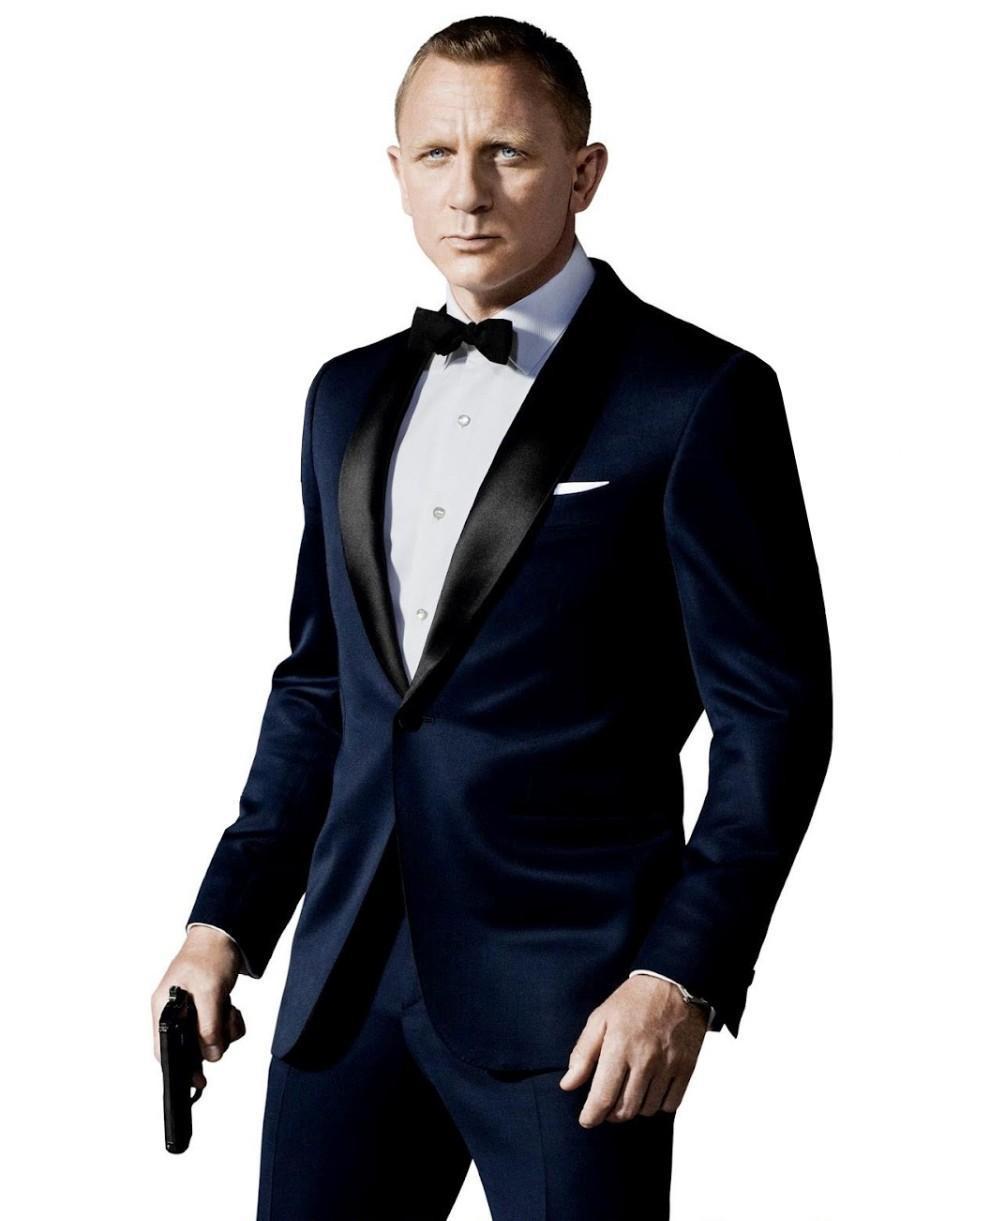 2015 Cheapest Wedding Tuxedo James Bond Wedding Suits for men ...